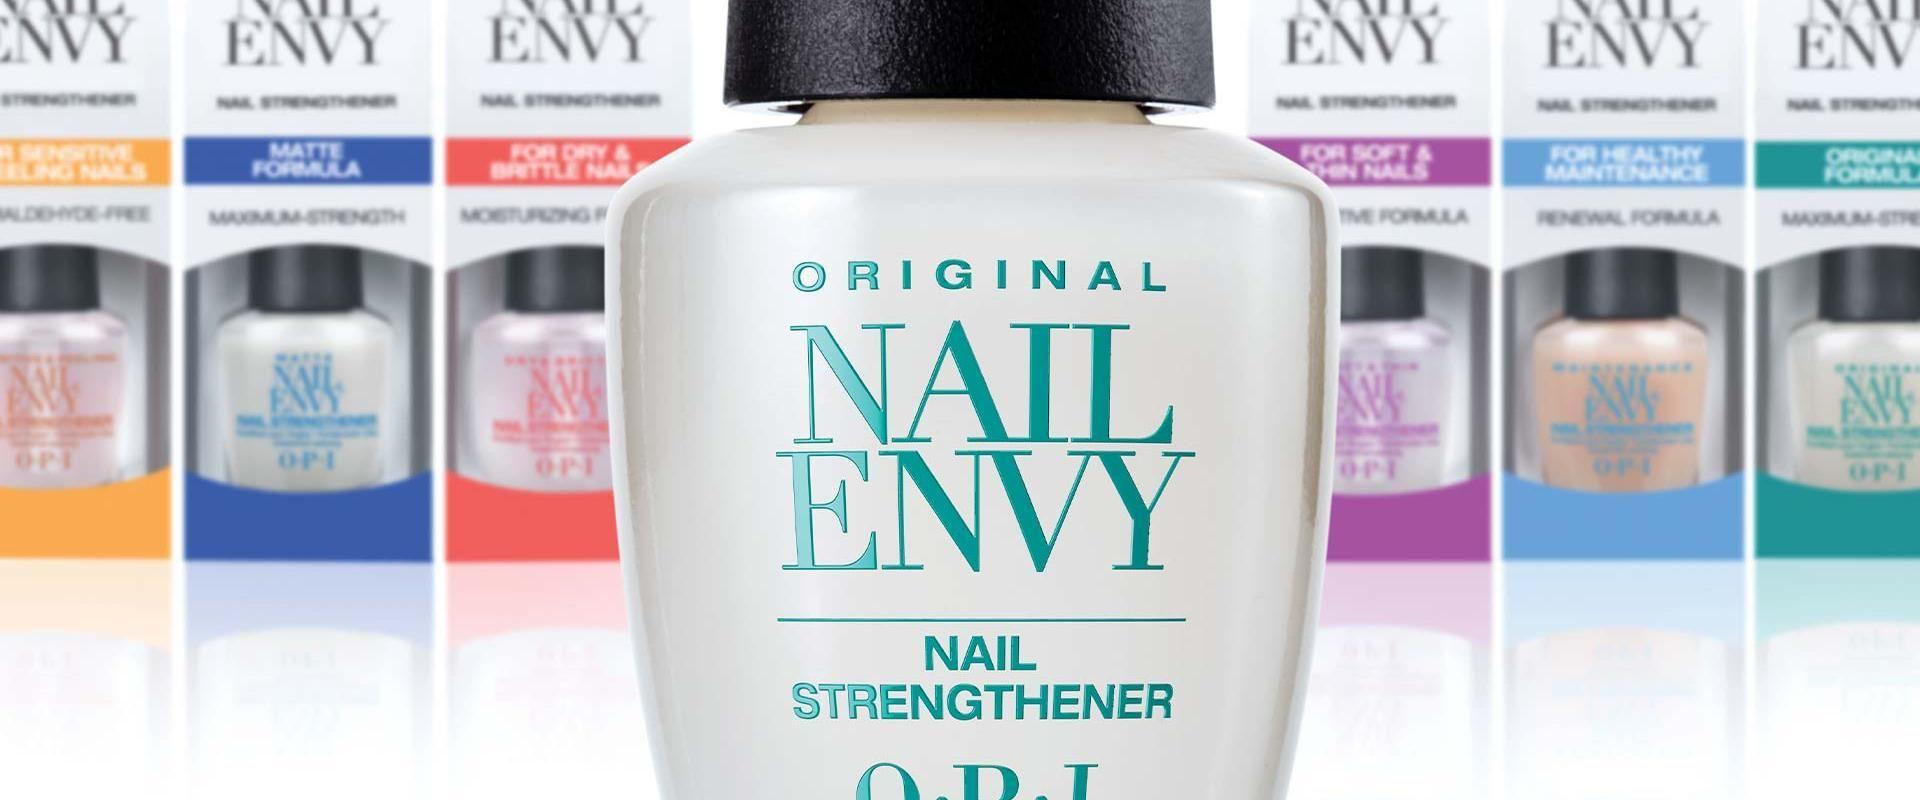 Nail Envy by OPI | Nail Strengthener | Beauty | Pinterest | Nail ...